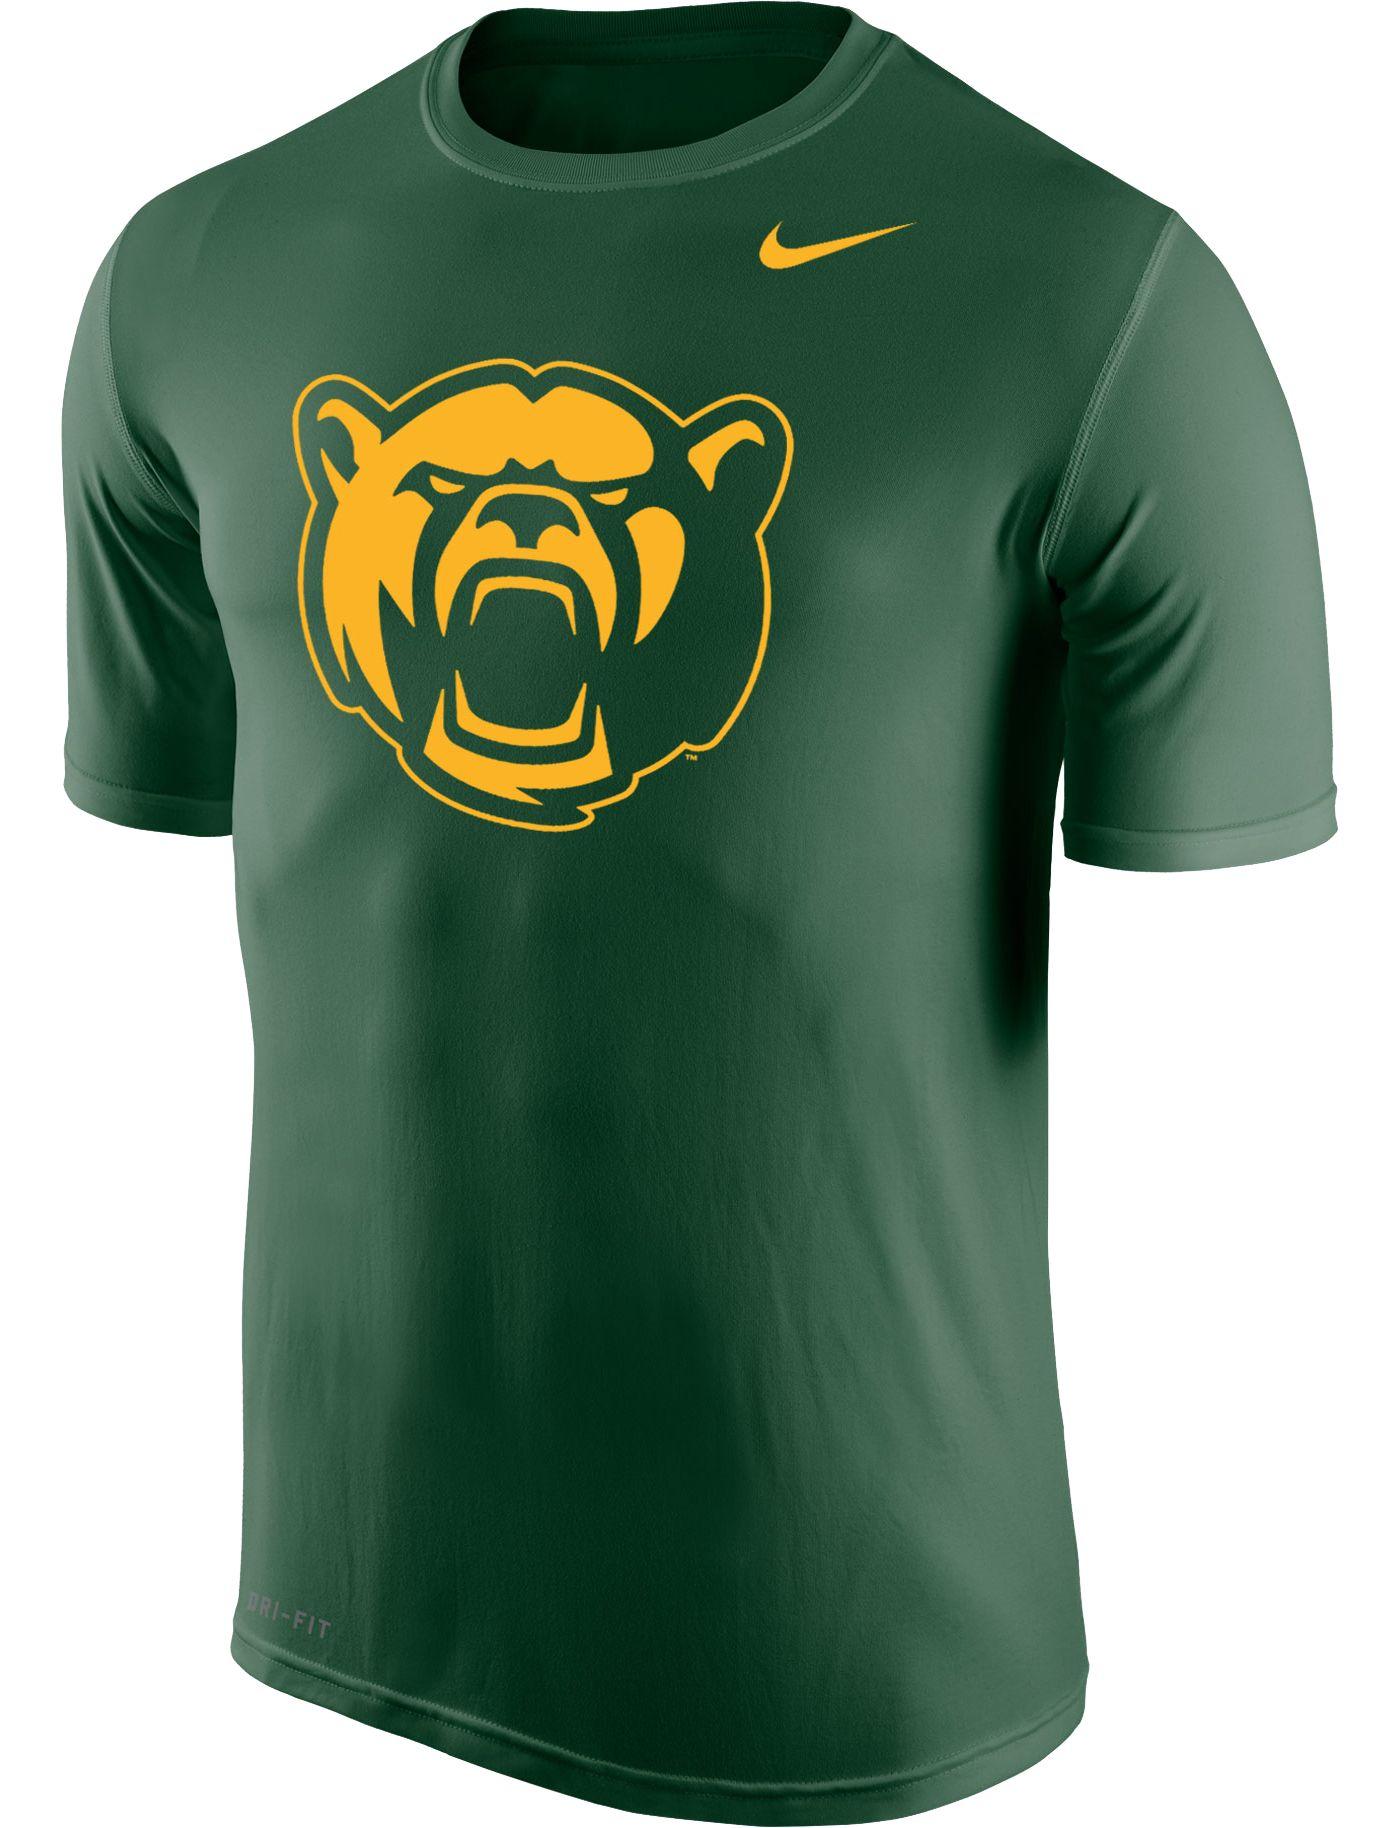 Nike Men's Baylor Bears Green Logo Dri-FIT Legend 2.0 T-Shirt